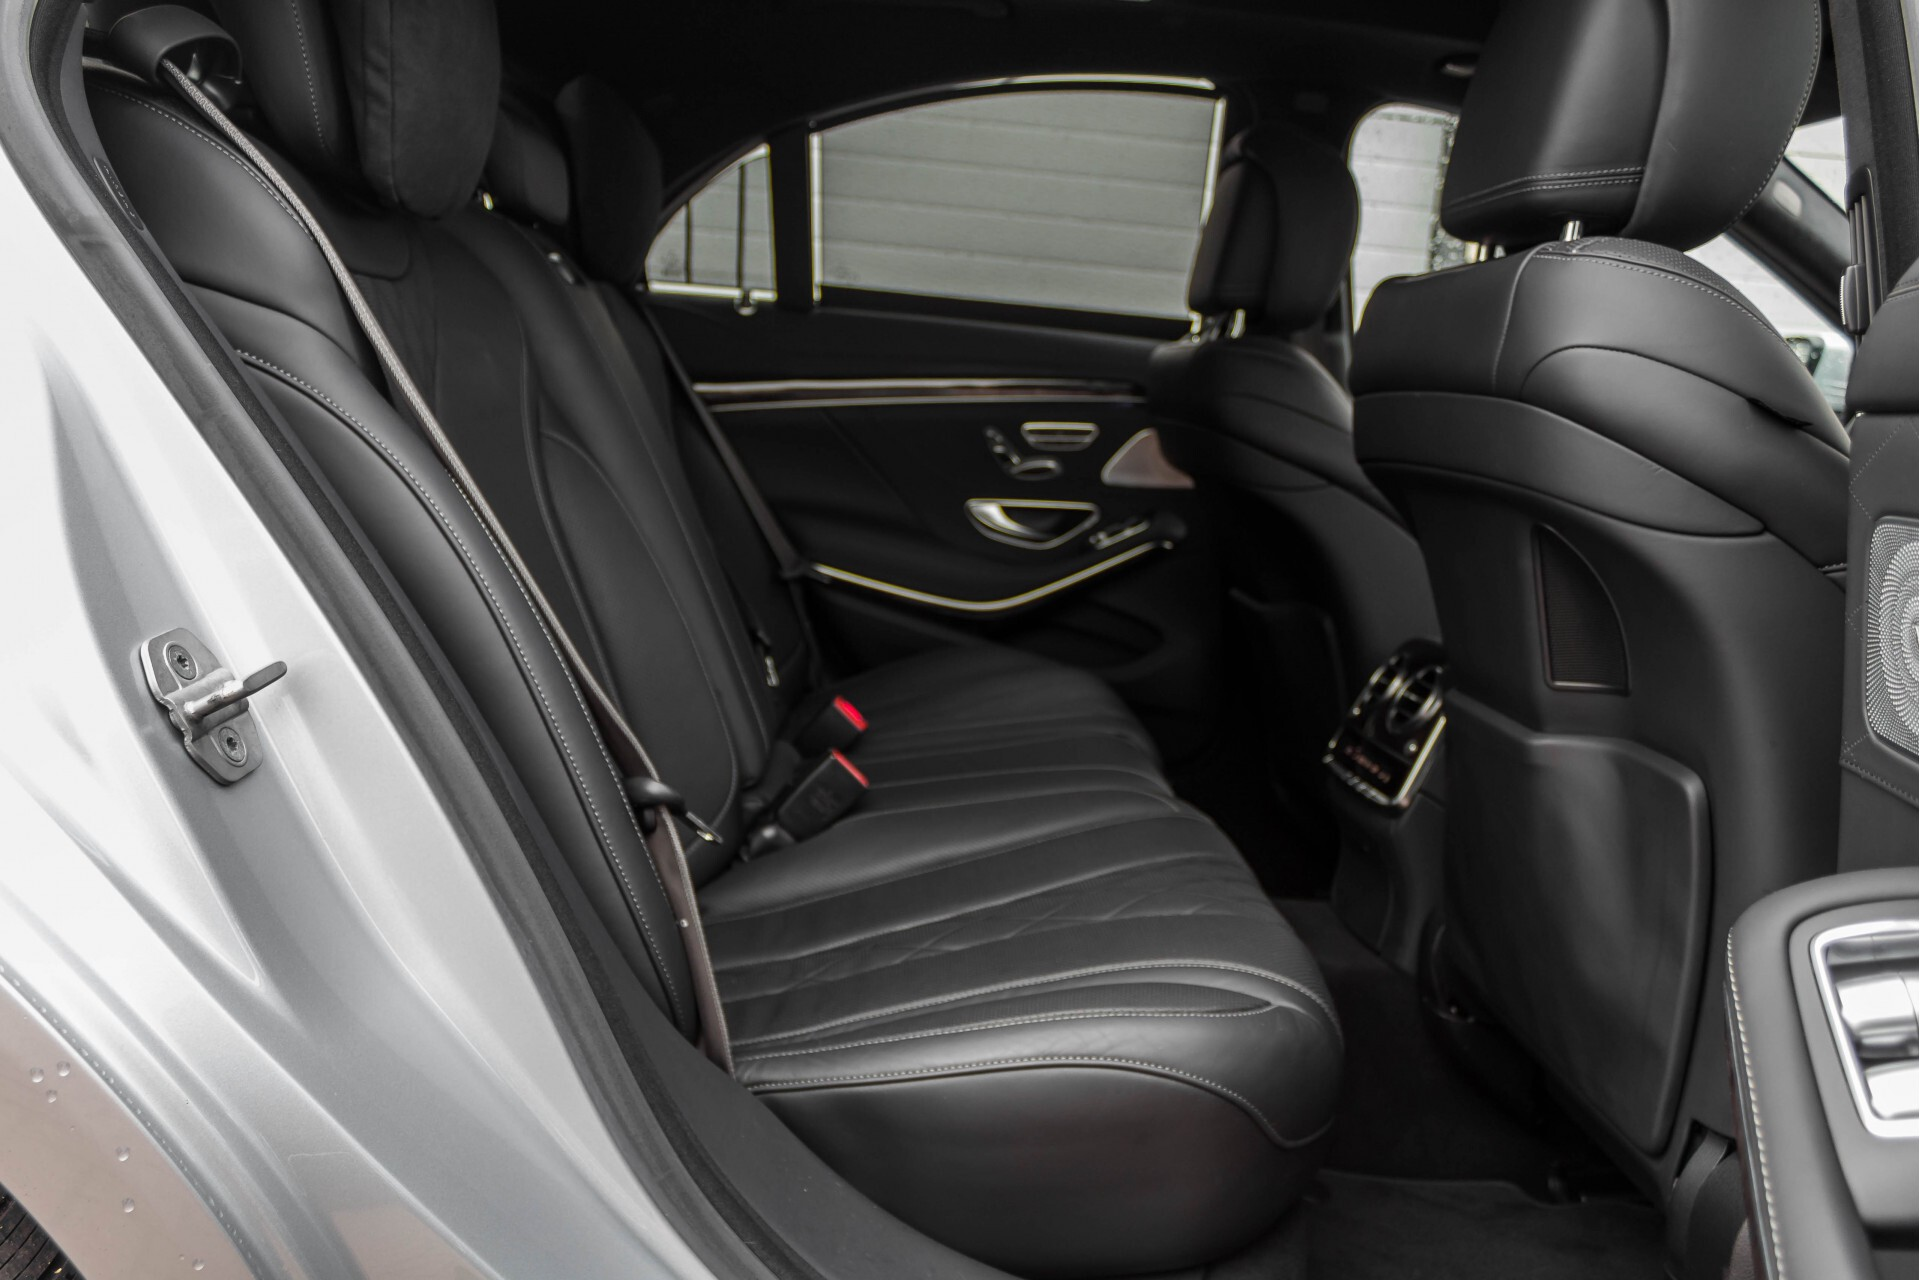 Mercedes-Benz S-Klasse 350 Bluetec Exclusive Panorama/Massage/Keyless/Distronic/Standkachel Aut7 Foto 4